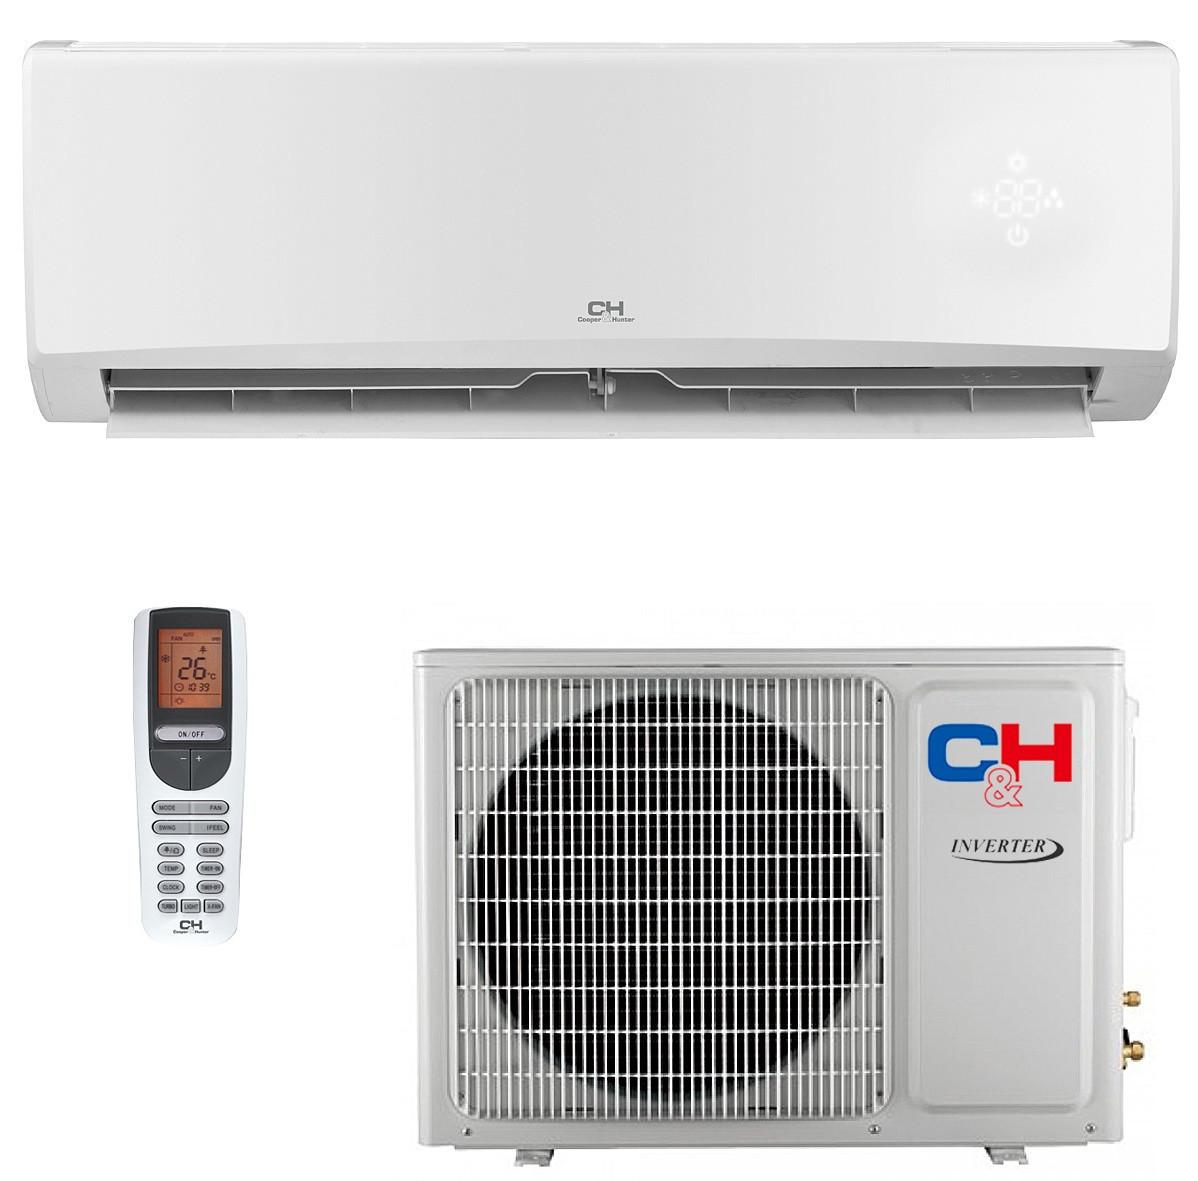 Кондиционер инверторный сплит-система Cooper&Hunter Alpha Inverter CH-S24FTXE-NG R32 Wi-Fi